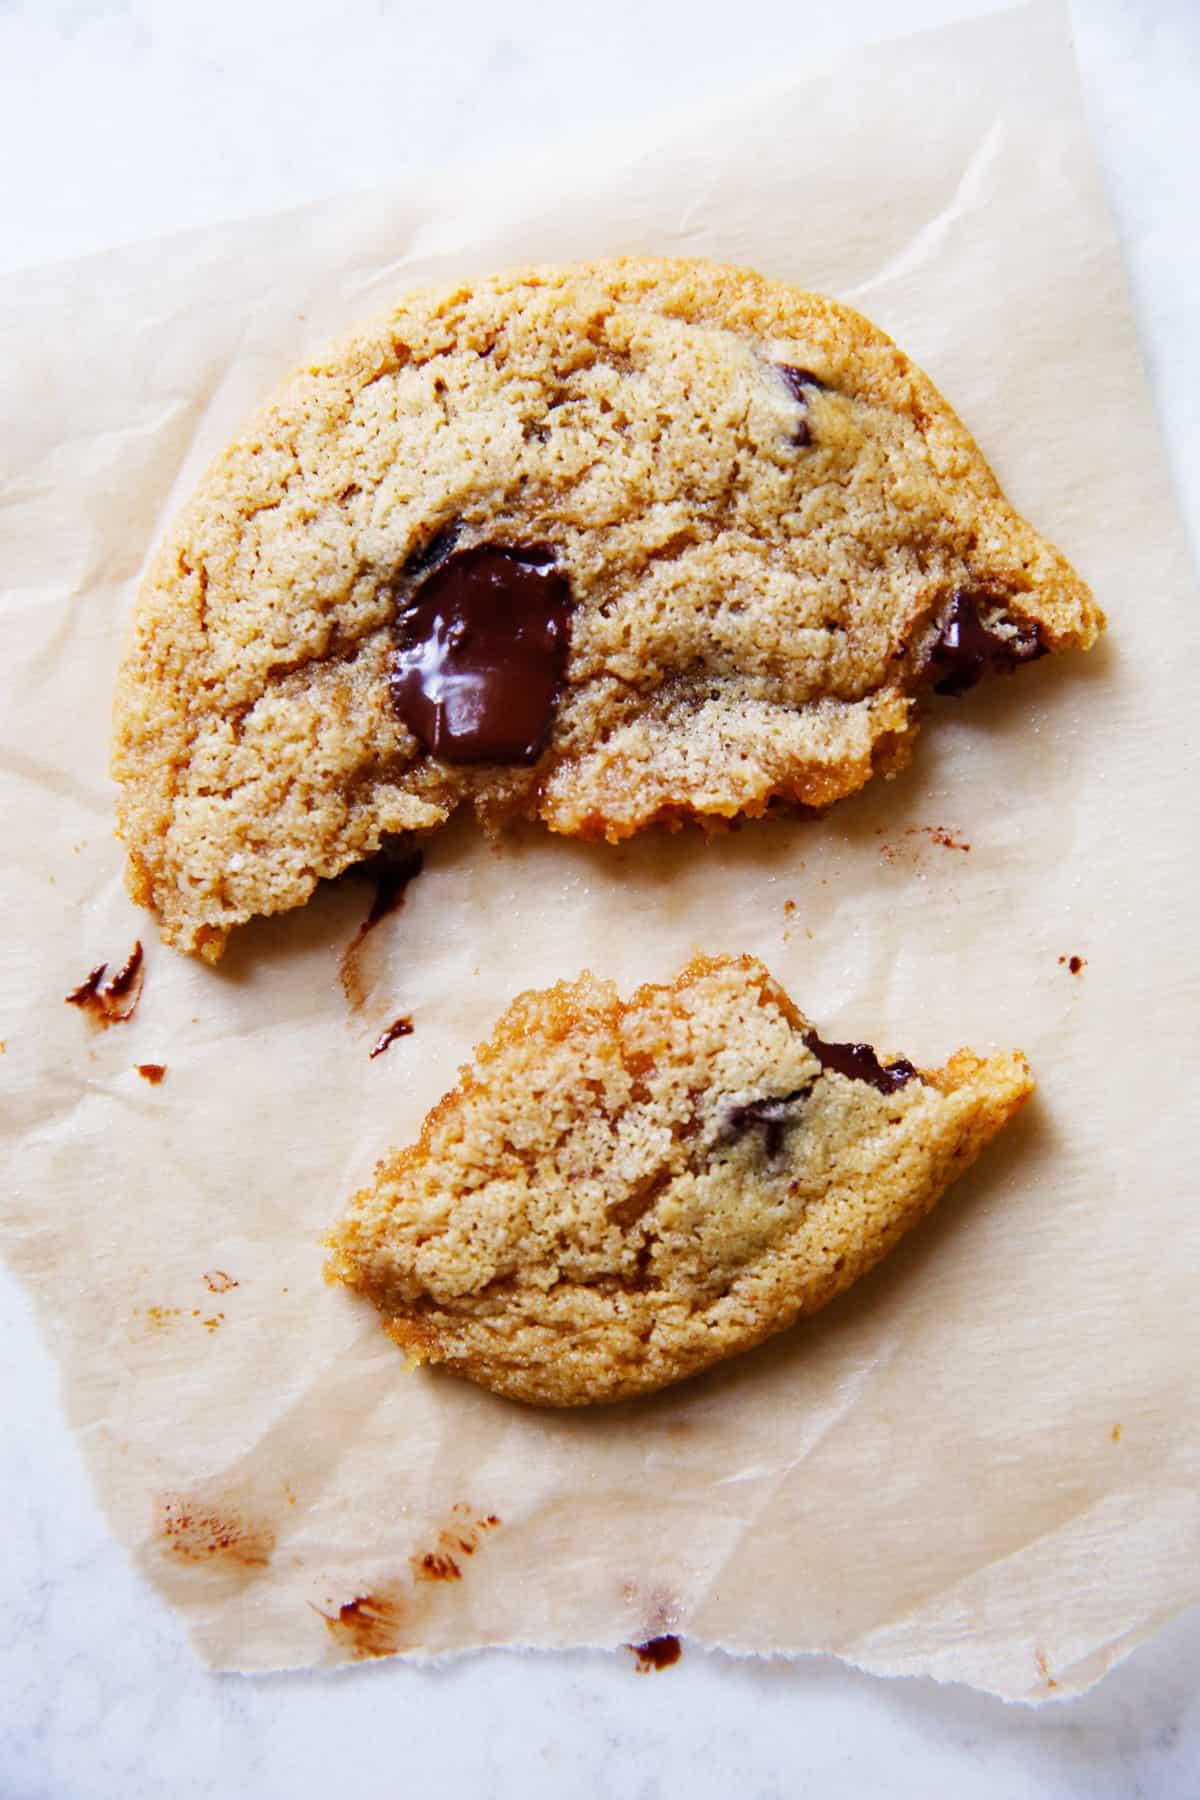 gluten free chocolate chip cookies broken apart